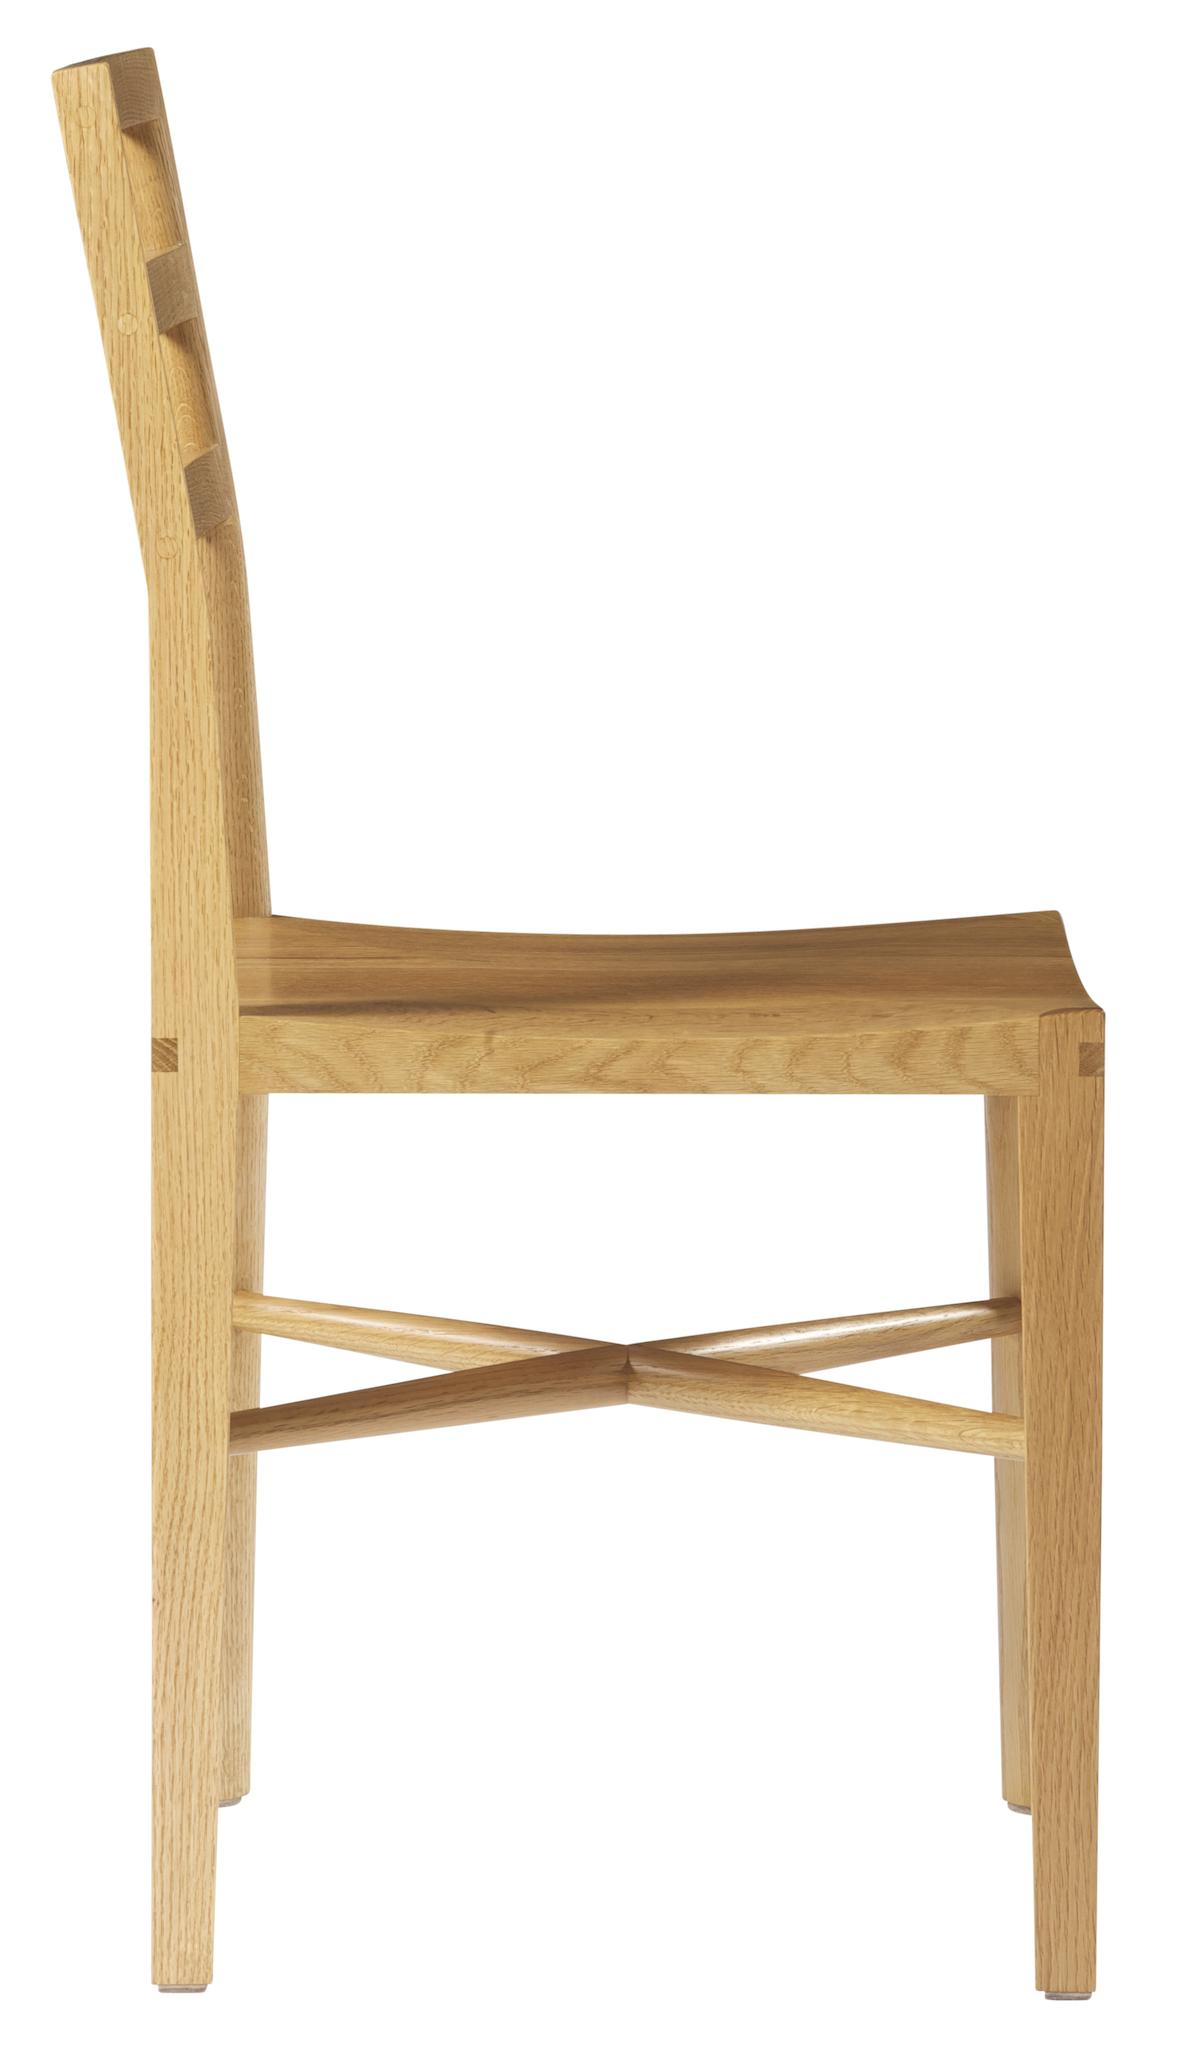 side view of a Quarter Round Ladderback Chair by artist Christopher Kurtz